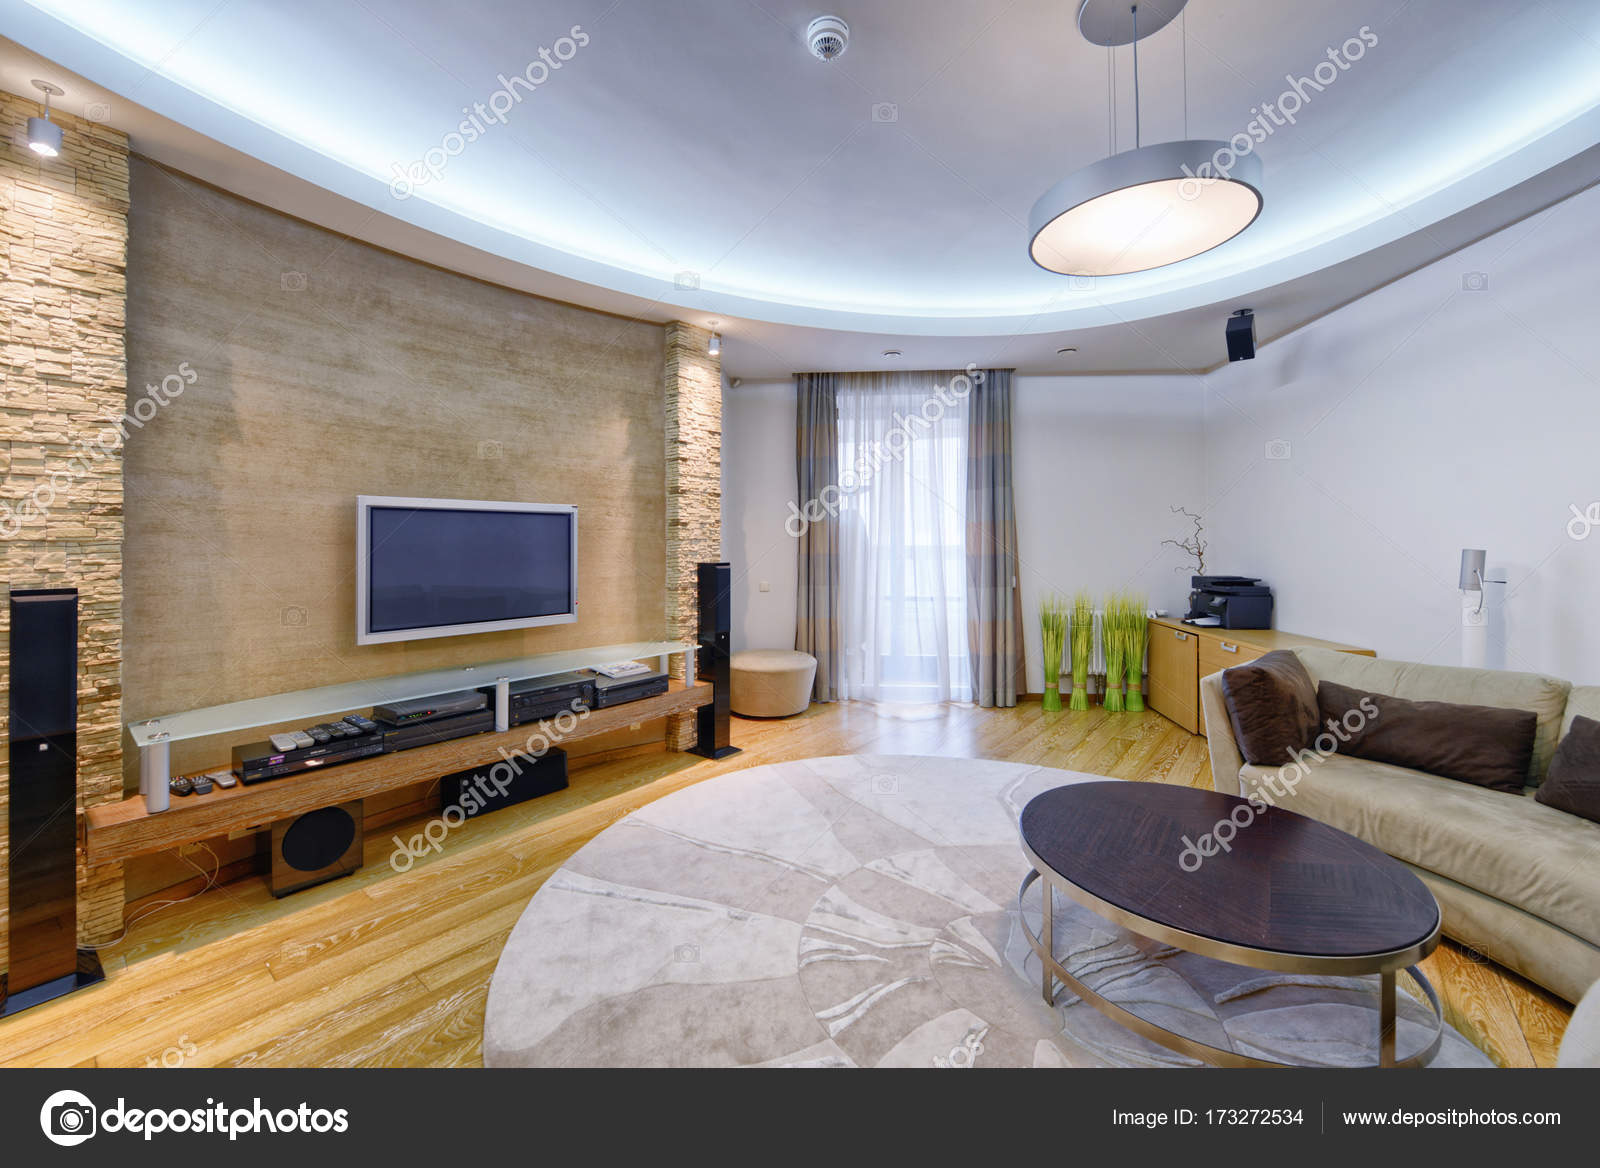 https://st3.depositphotos.com/4730441/17327/i/1600/depositphotos_173272534-stockafbeelding-woonkamer-interieur-in-moderne-huis.jpg